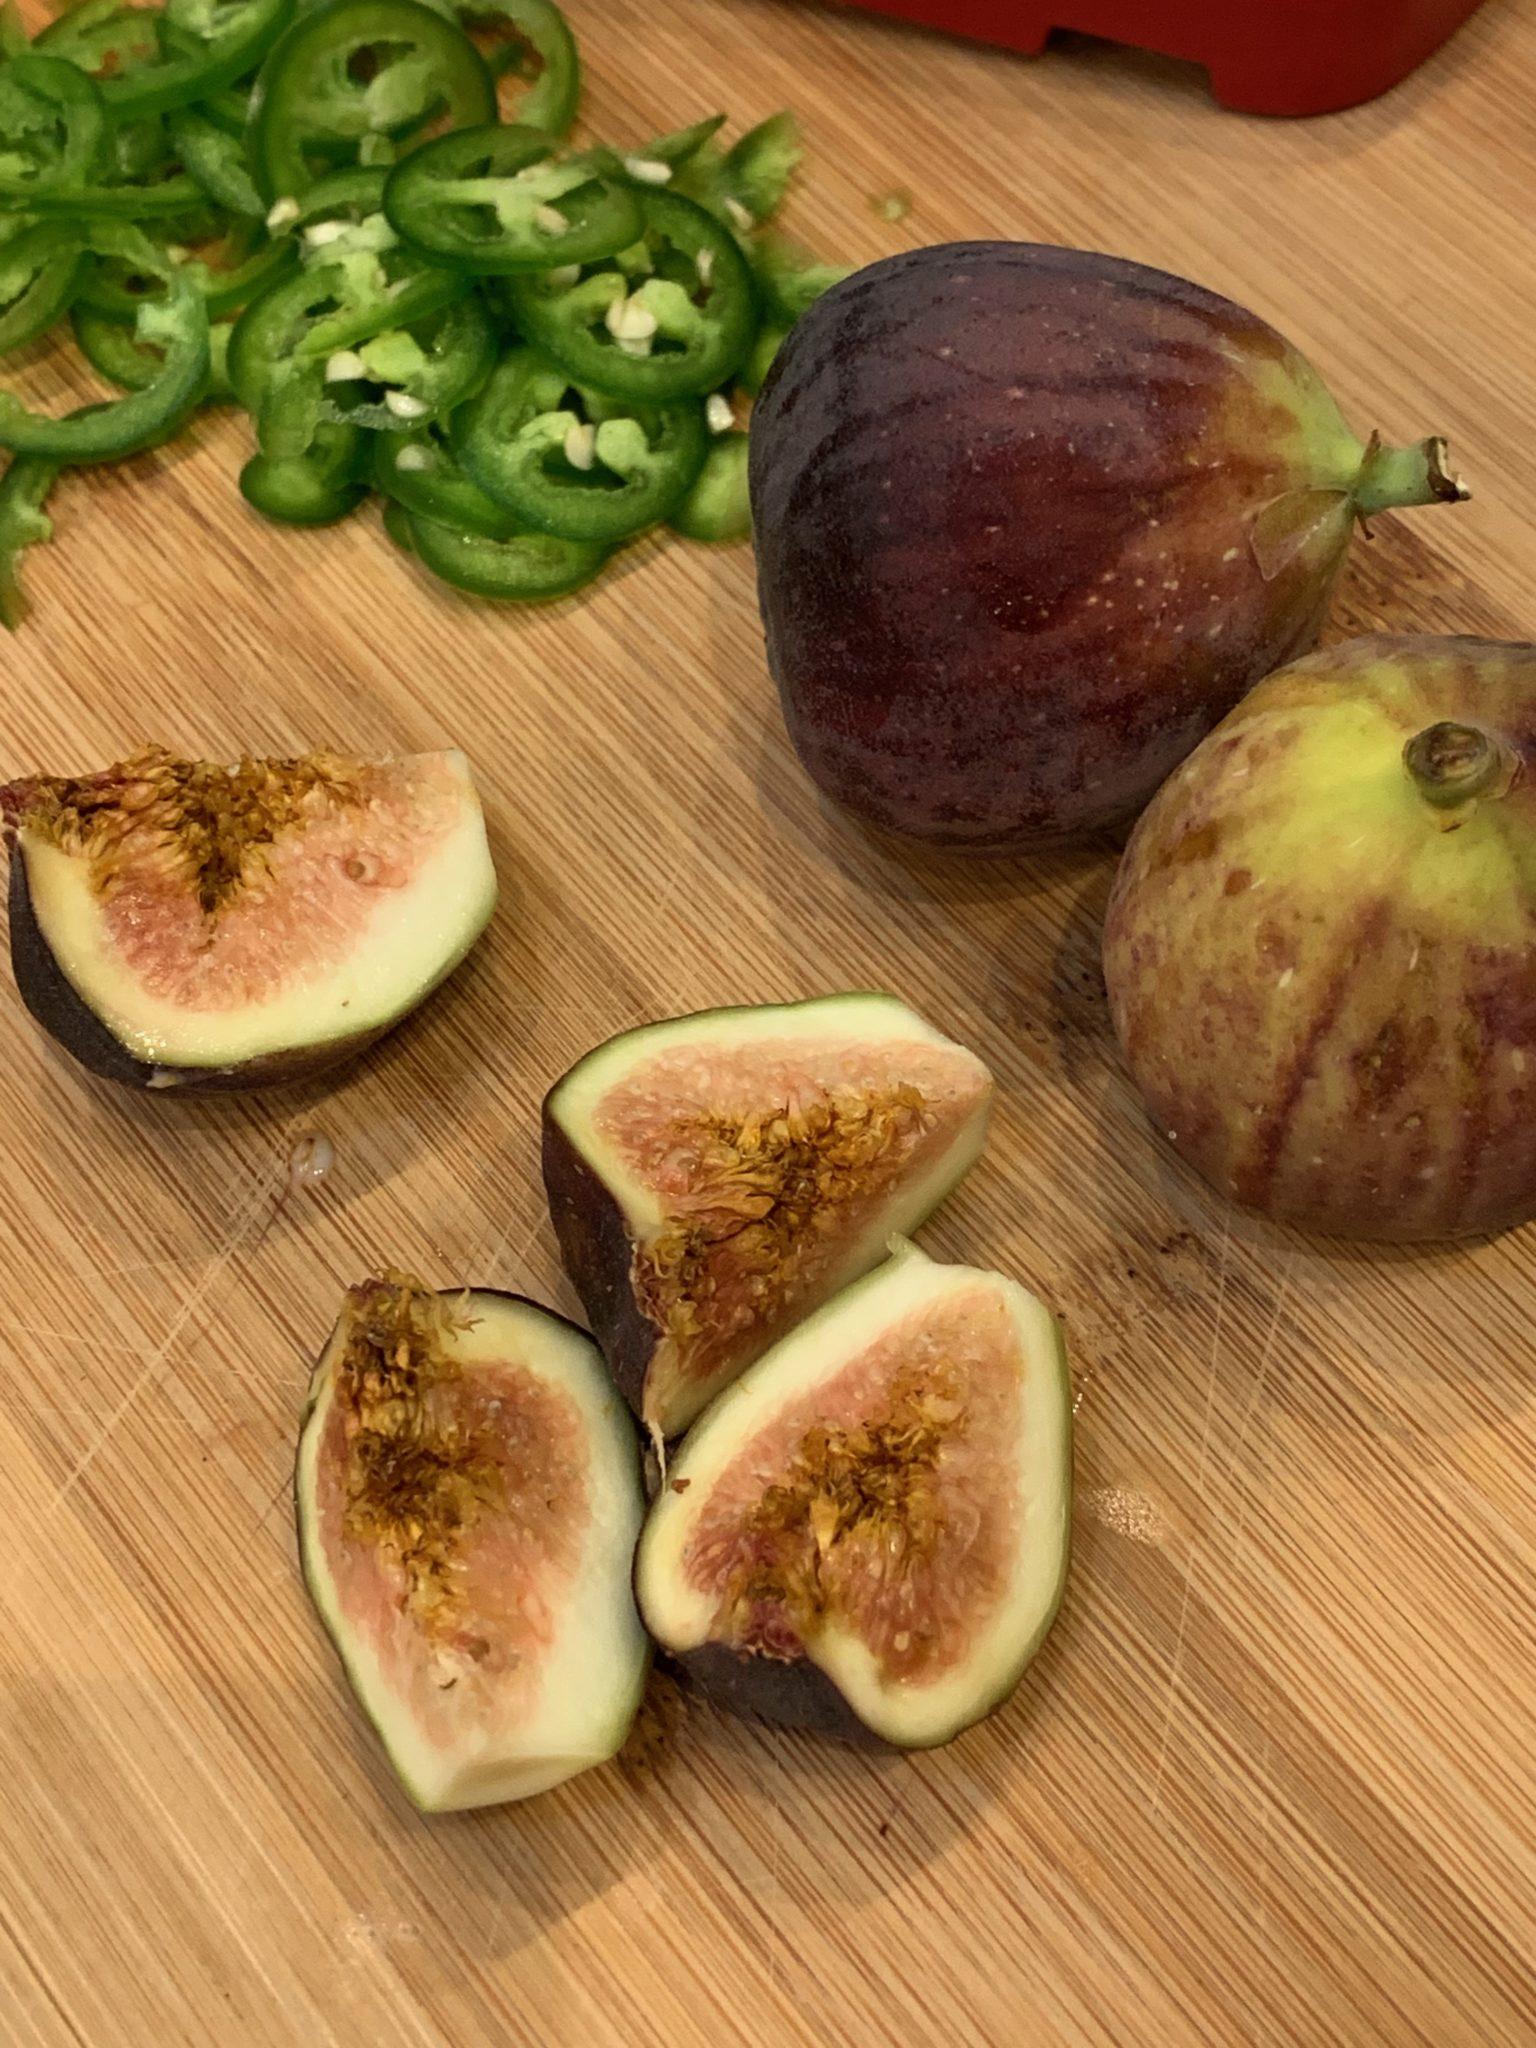 quarter mission figs